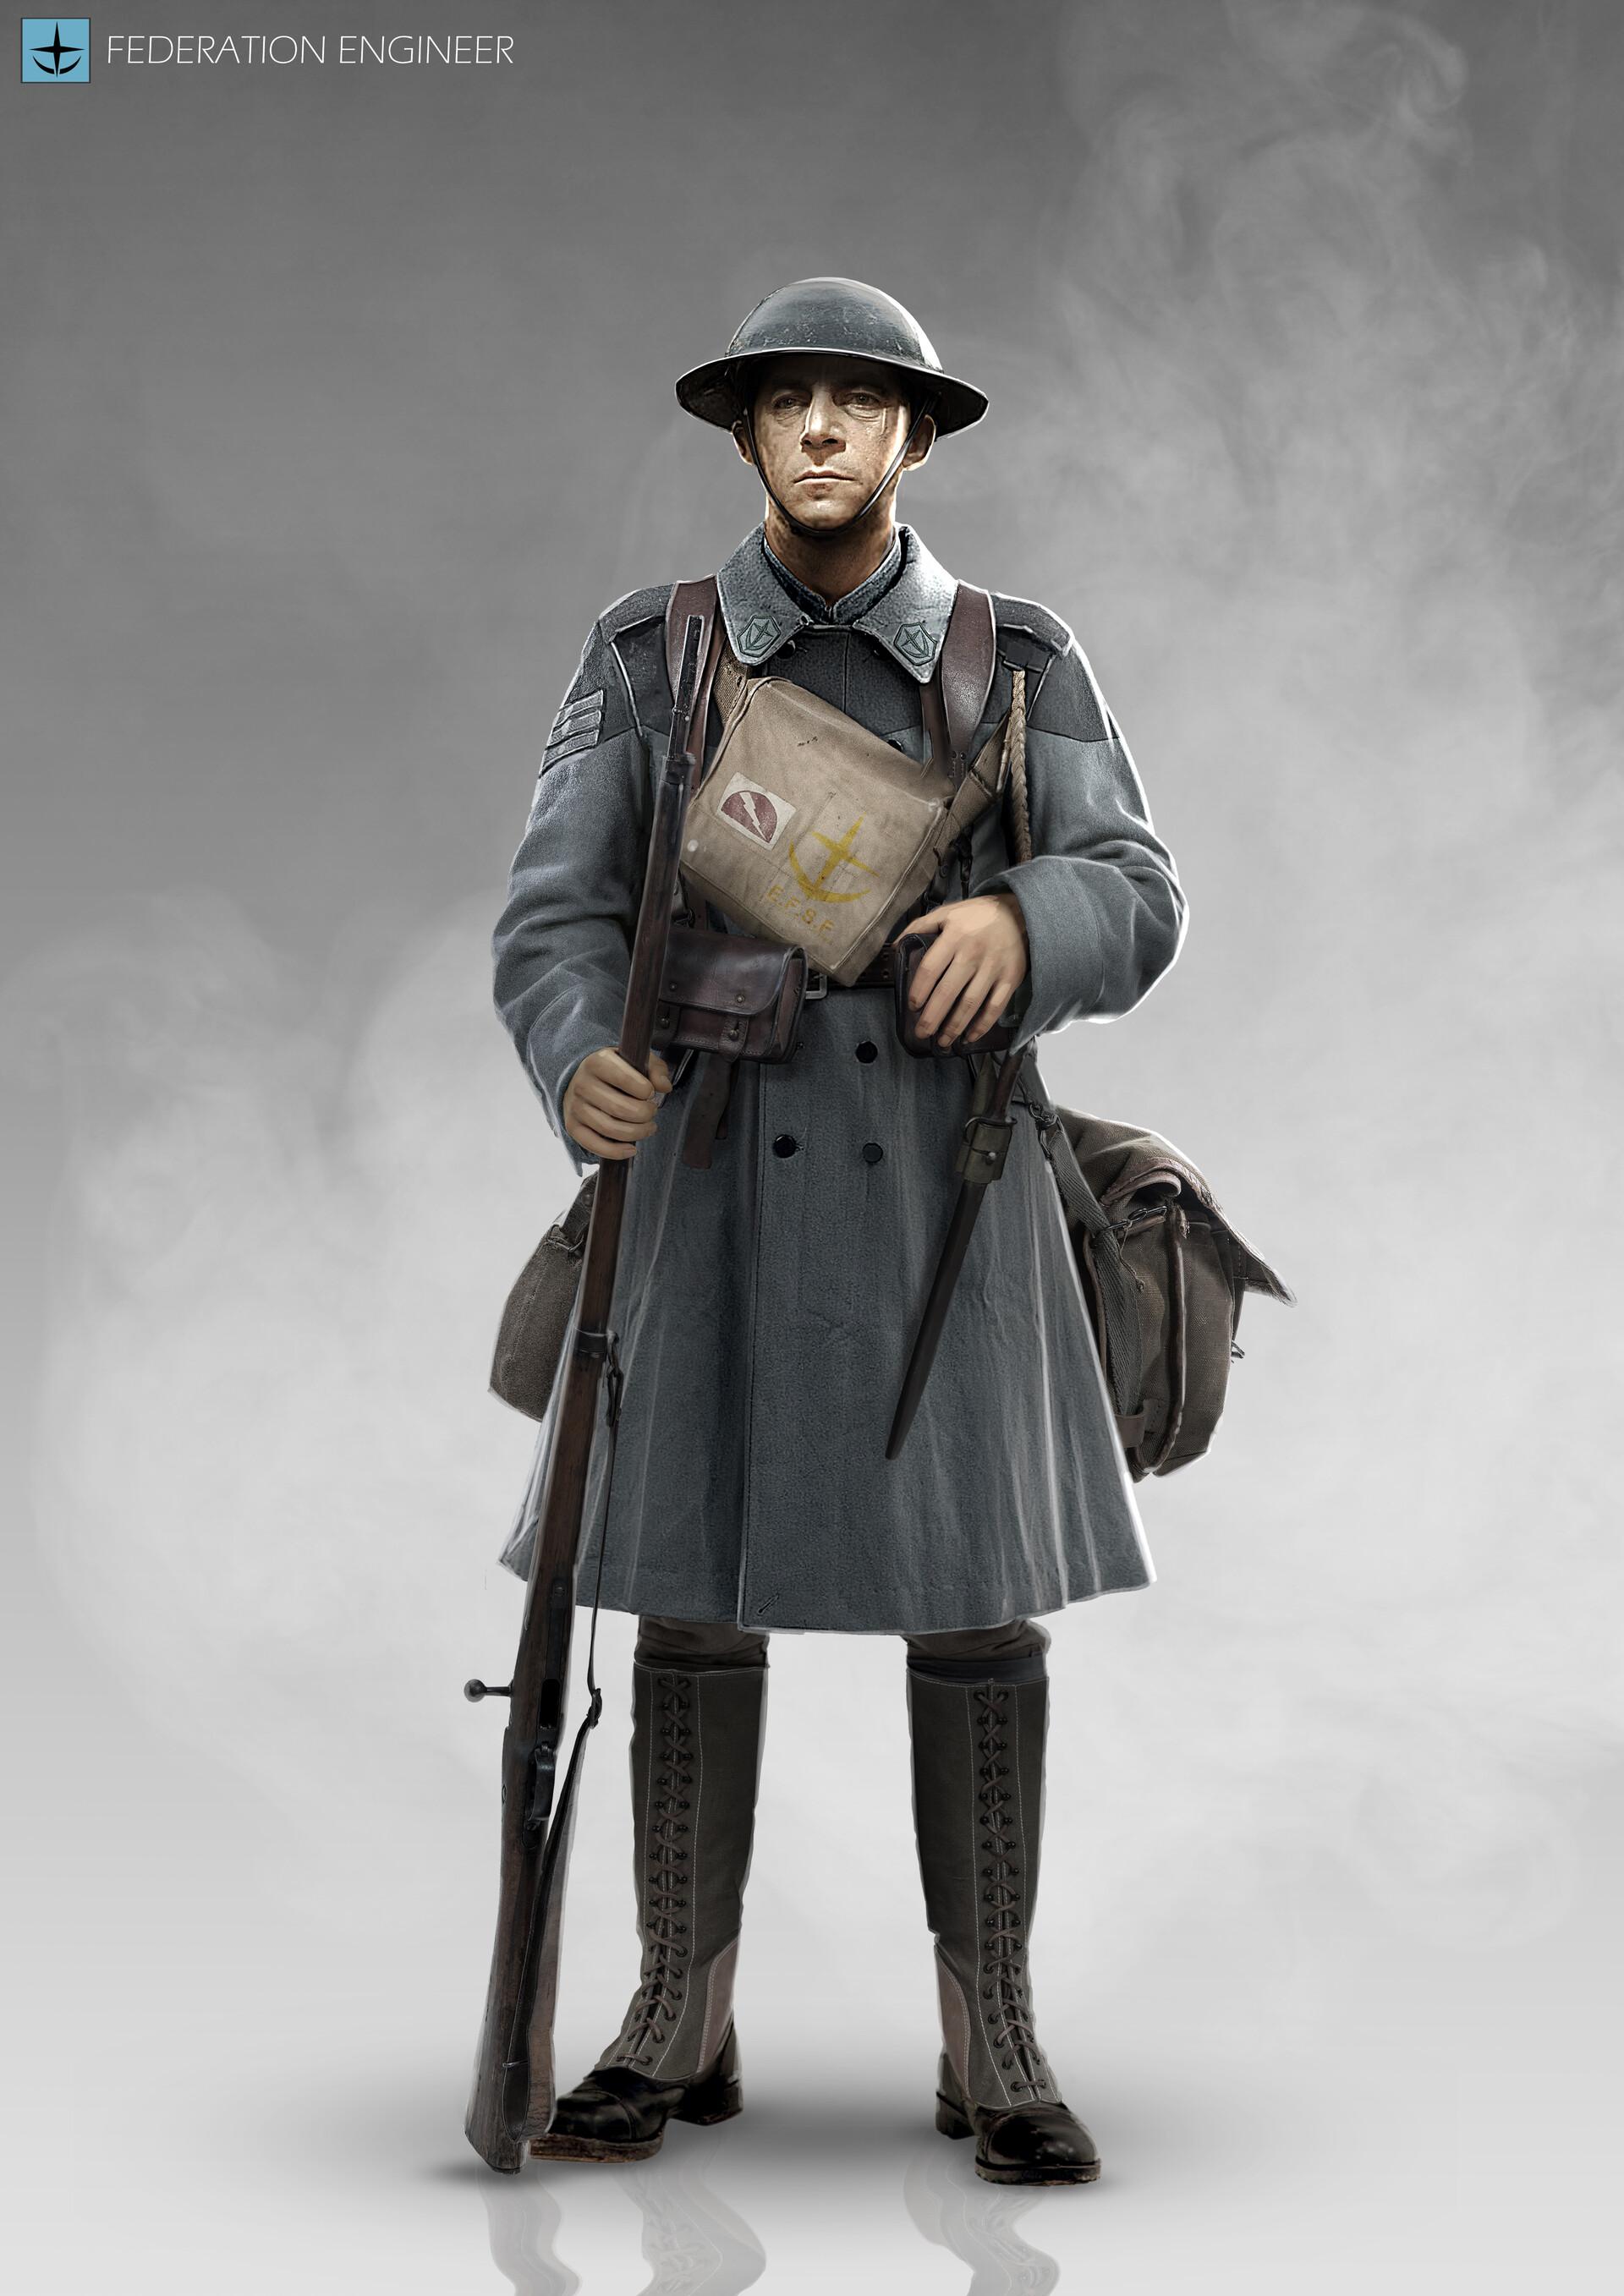 Charles Lin - Gundam 1919 - Federation Soldier